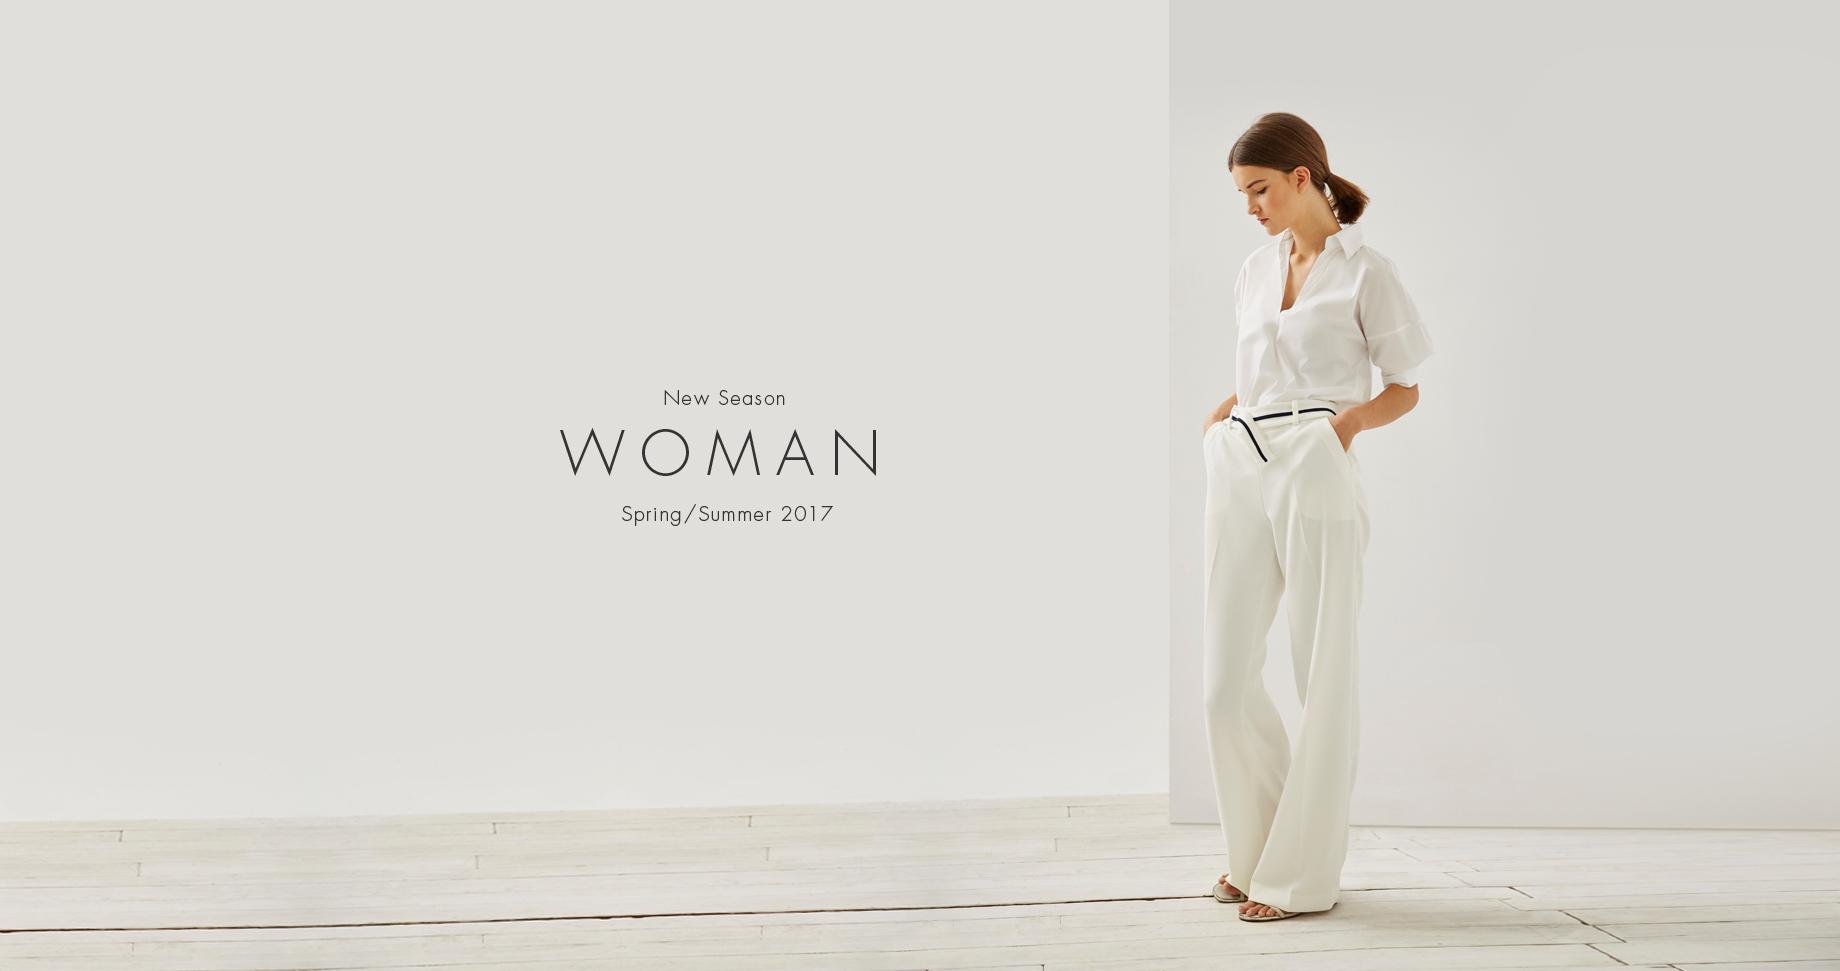 New season woman